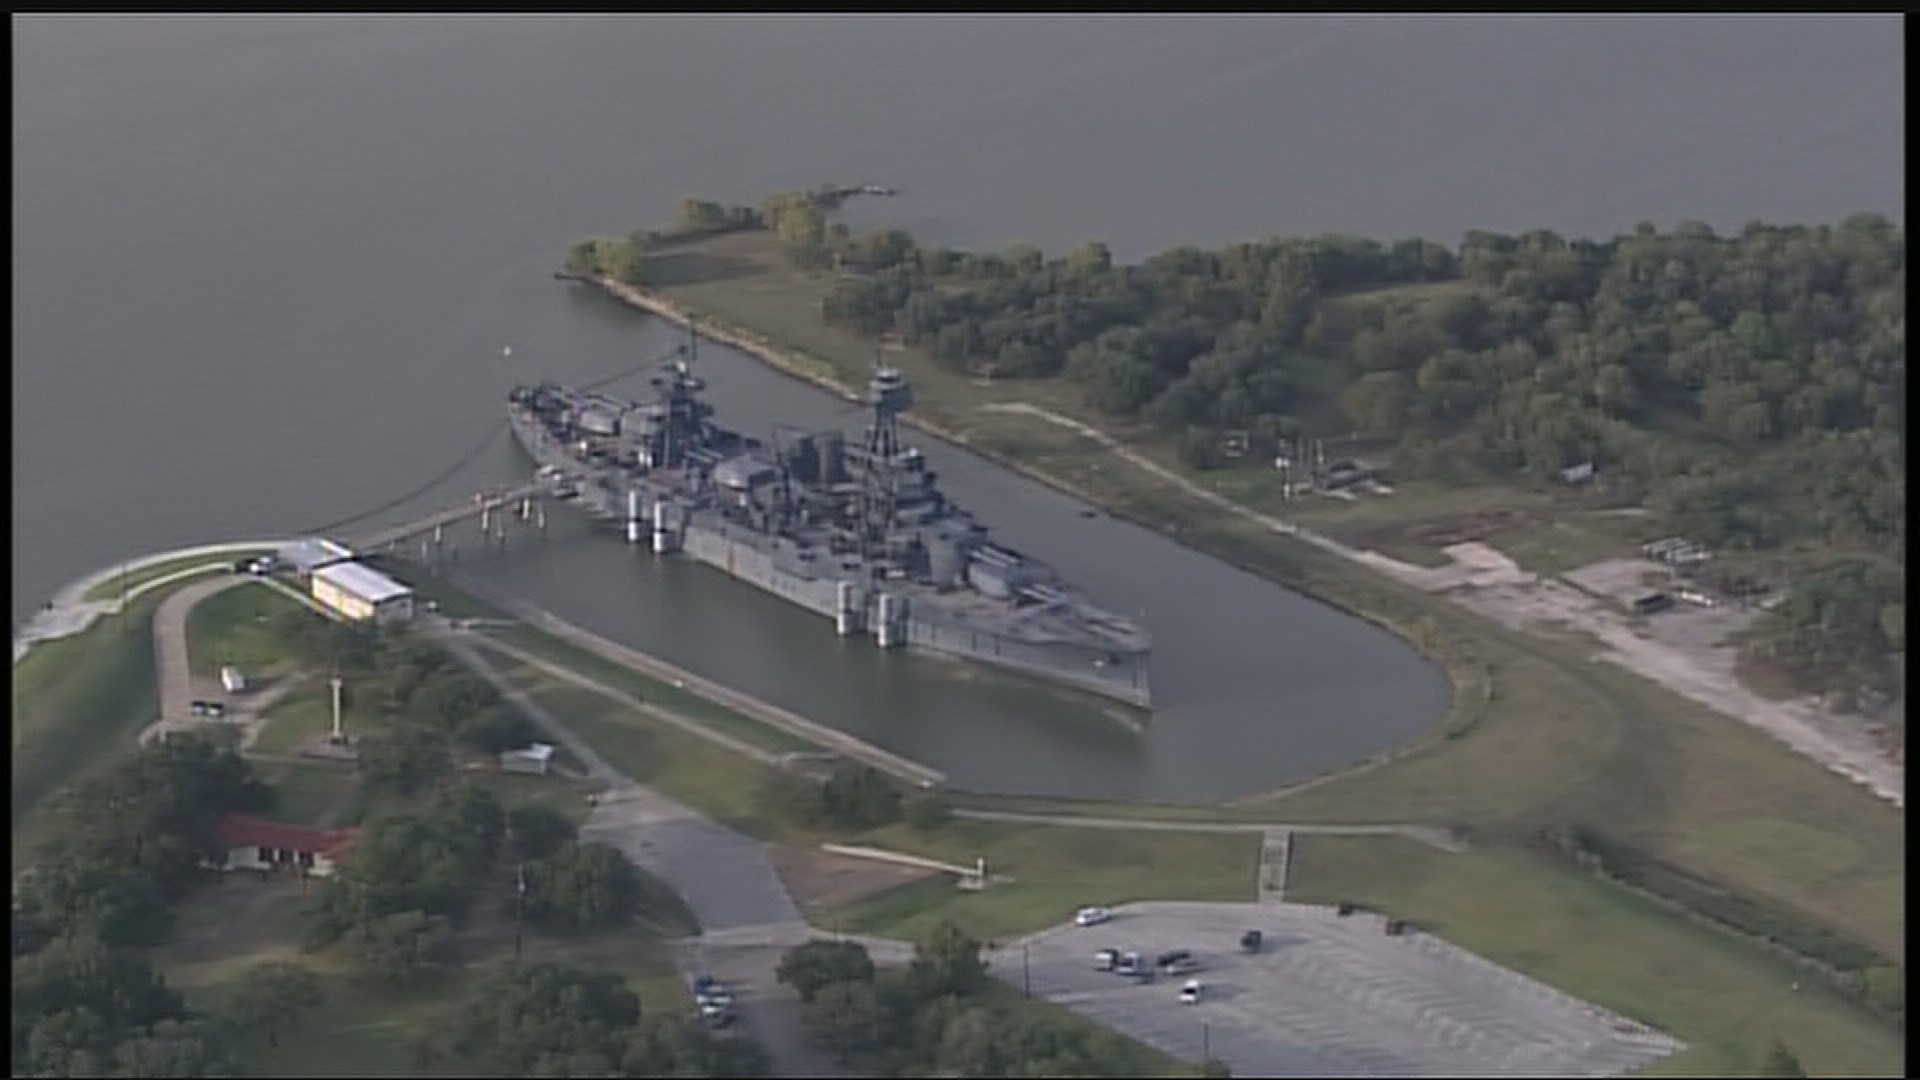 Battleship texas to reopen sunday after leak for La porte tx breaking news